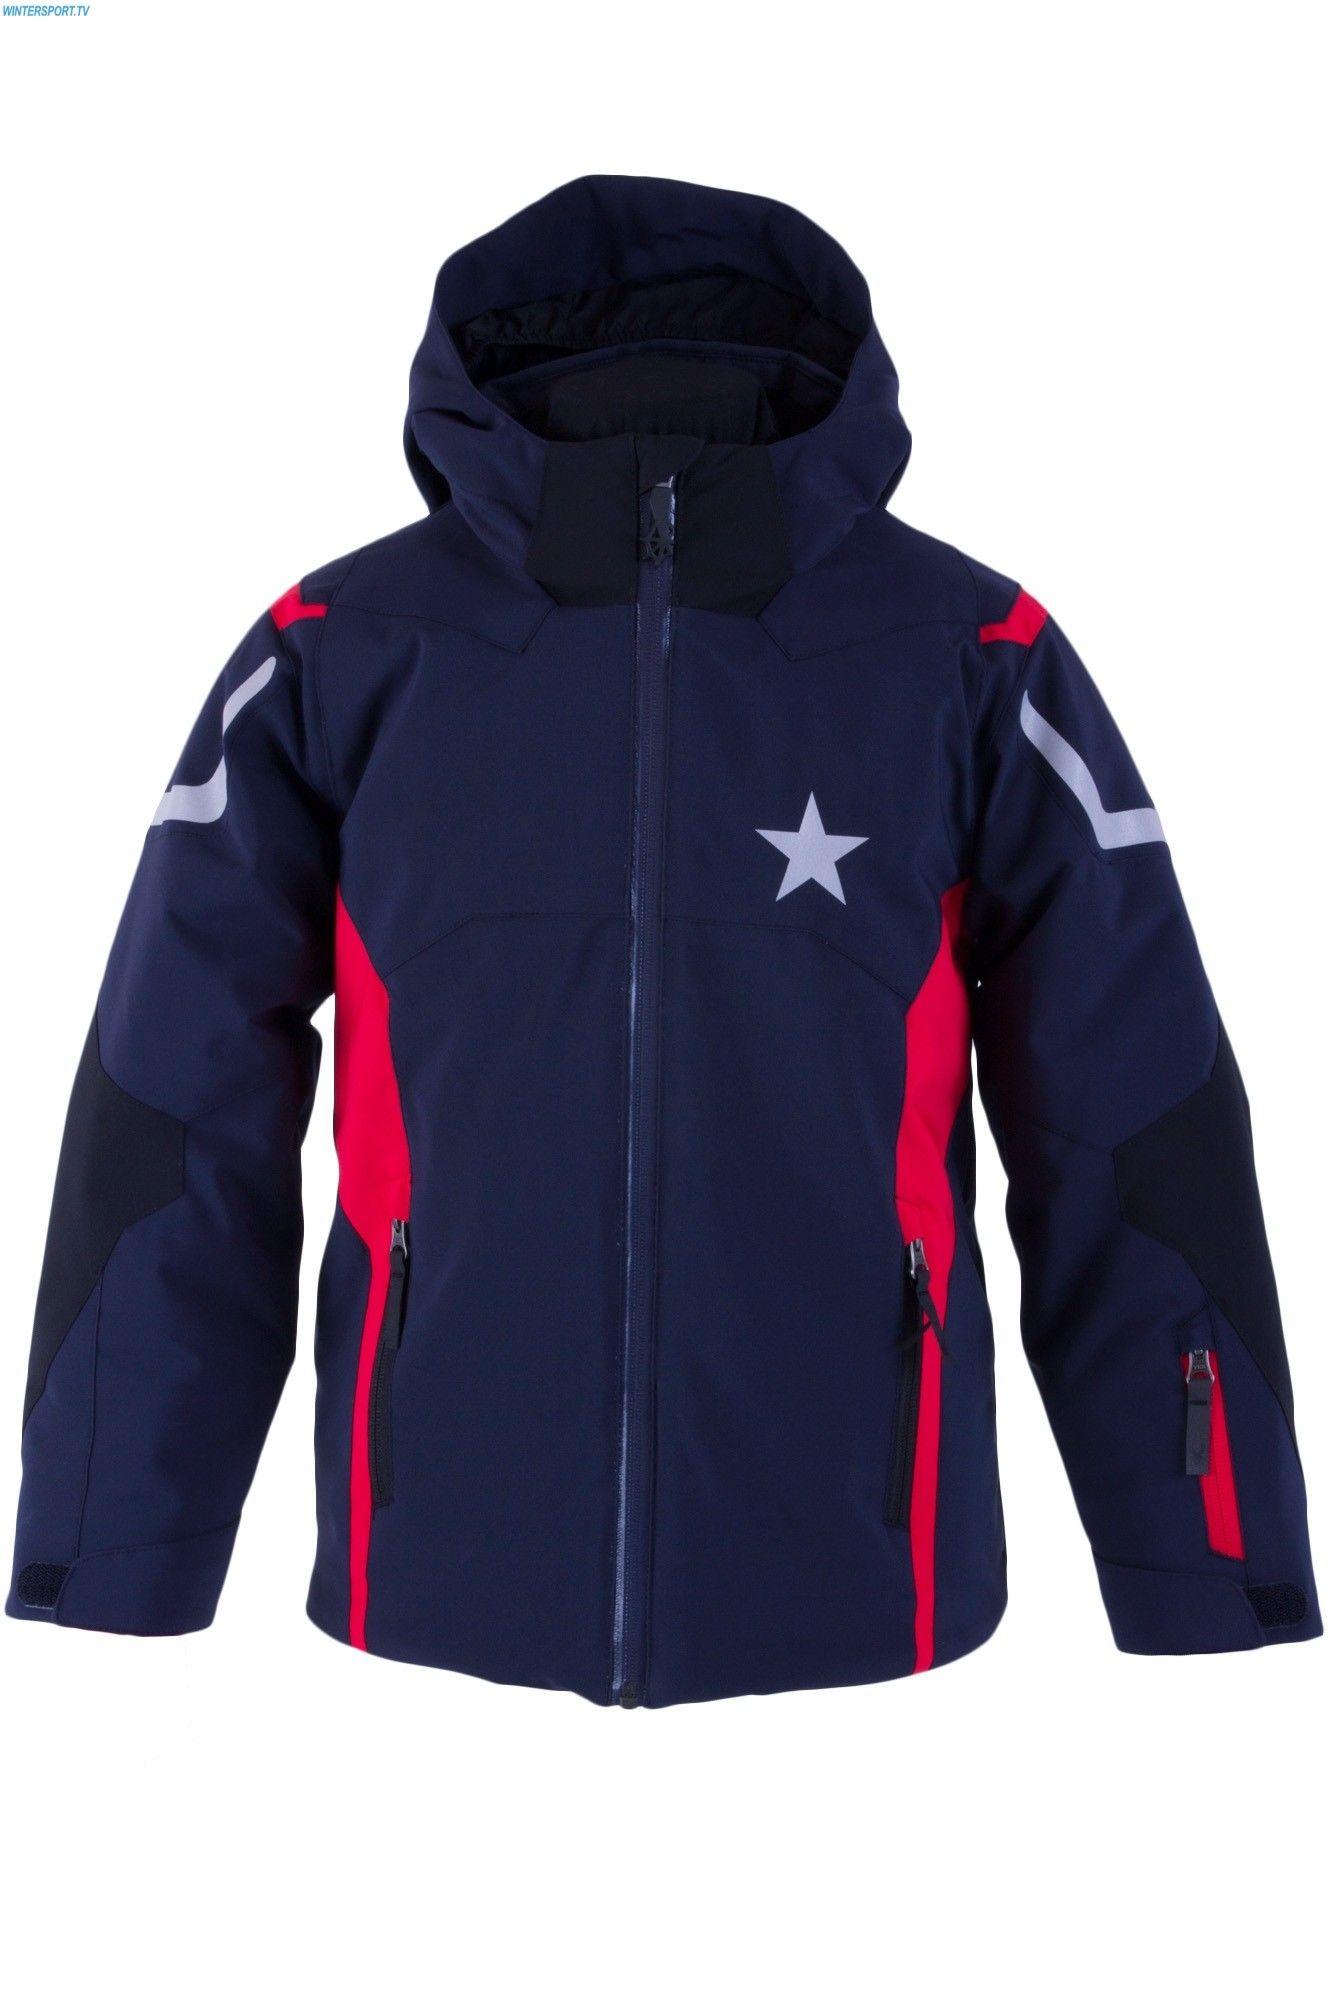 ceba518c1483 Spyder Boy Marvel Hero Jacket - Frontier Captain America